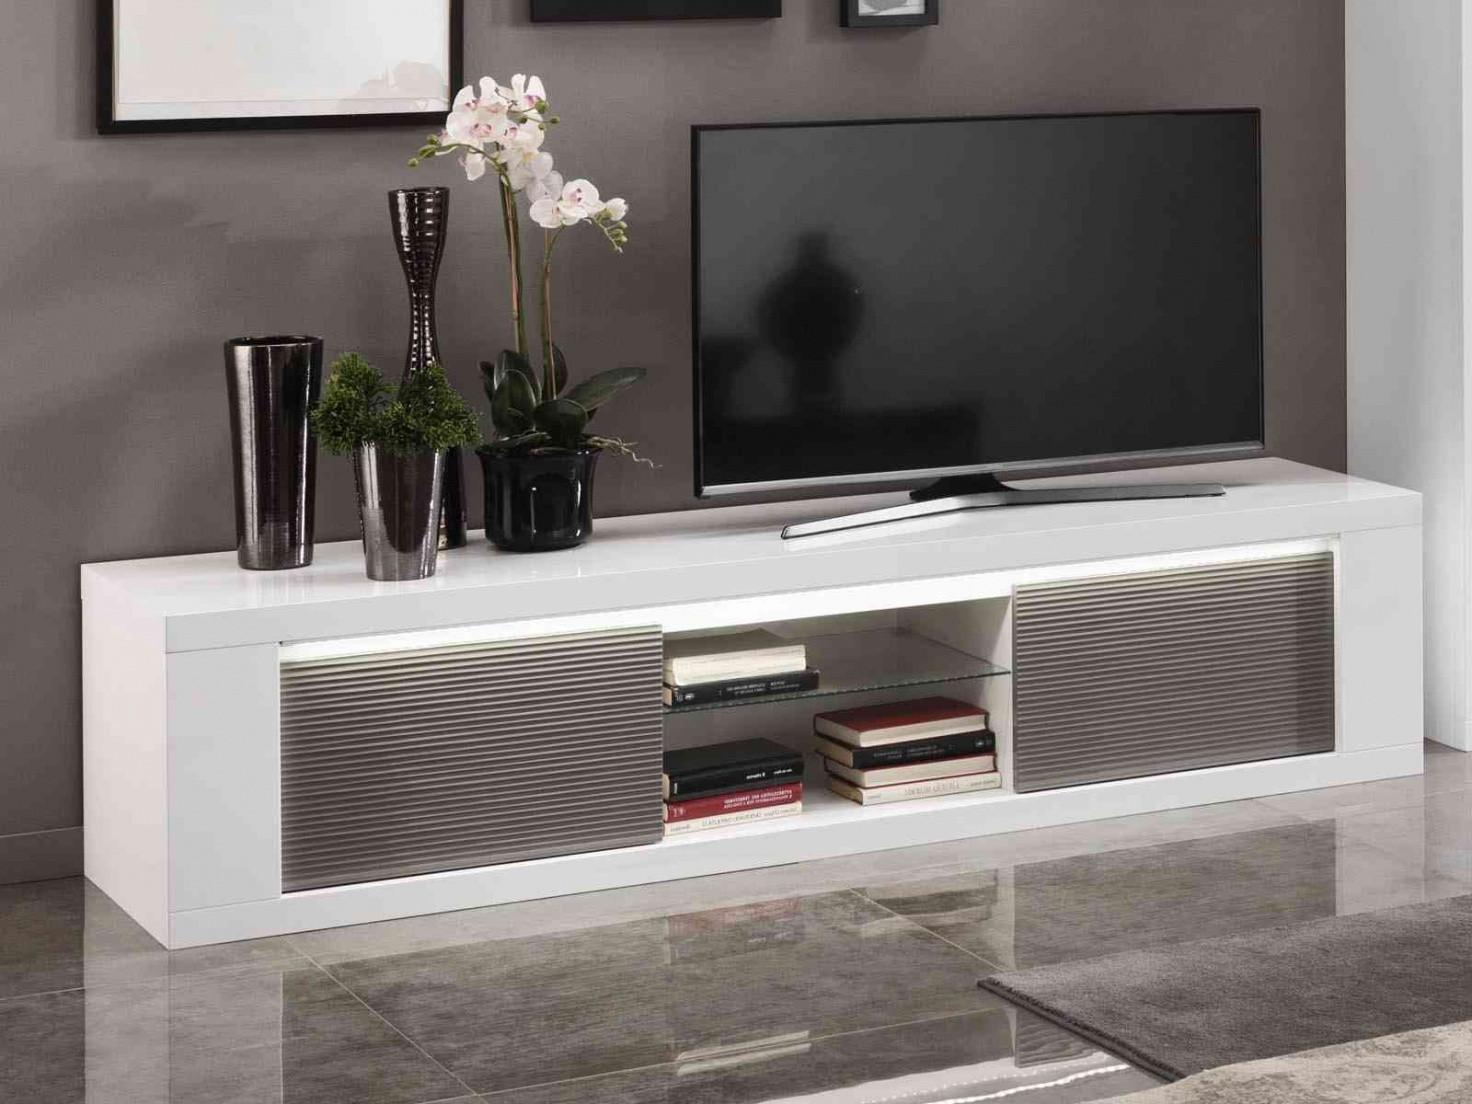 meuble tv 140 meuble tv 140 inspirant meuble tv bois origins meuble 0d trad hus of meuble tv 140